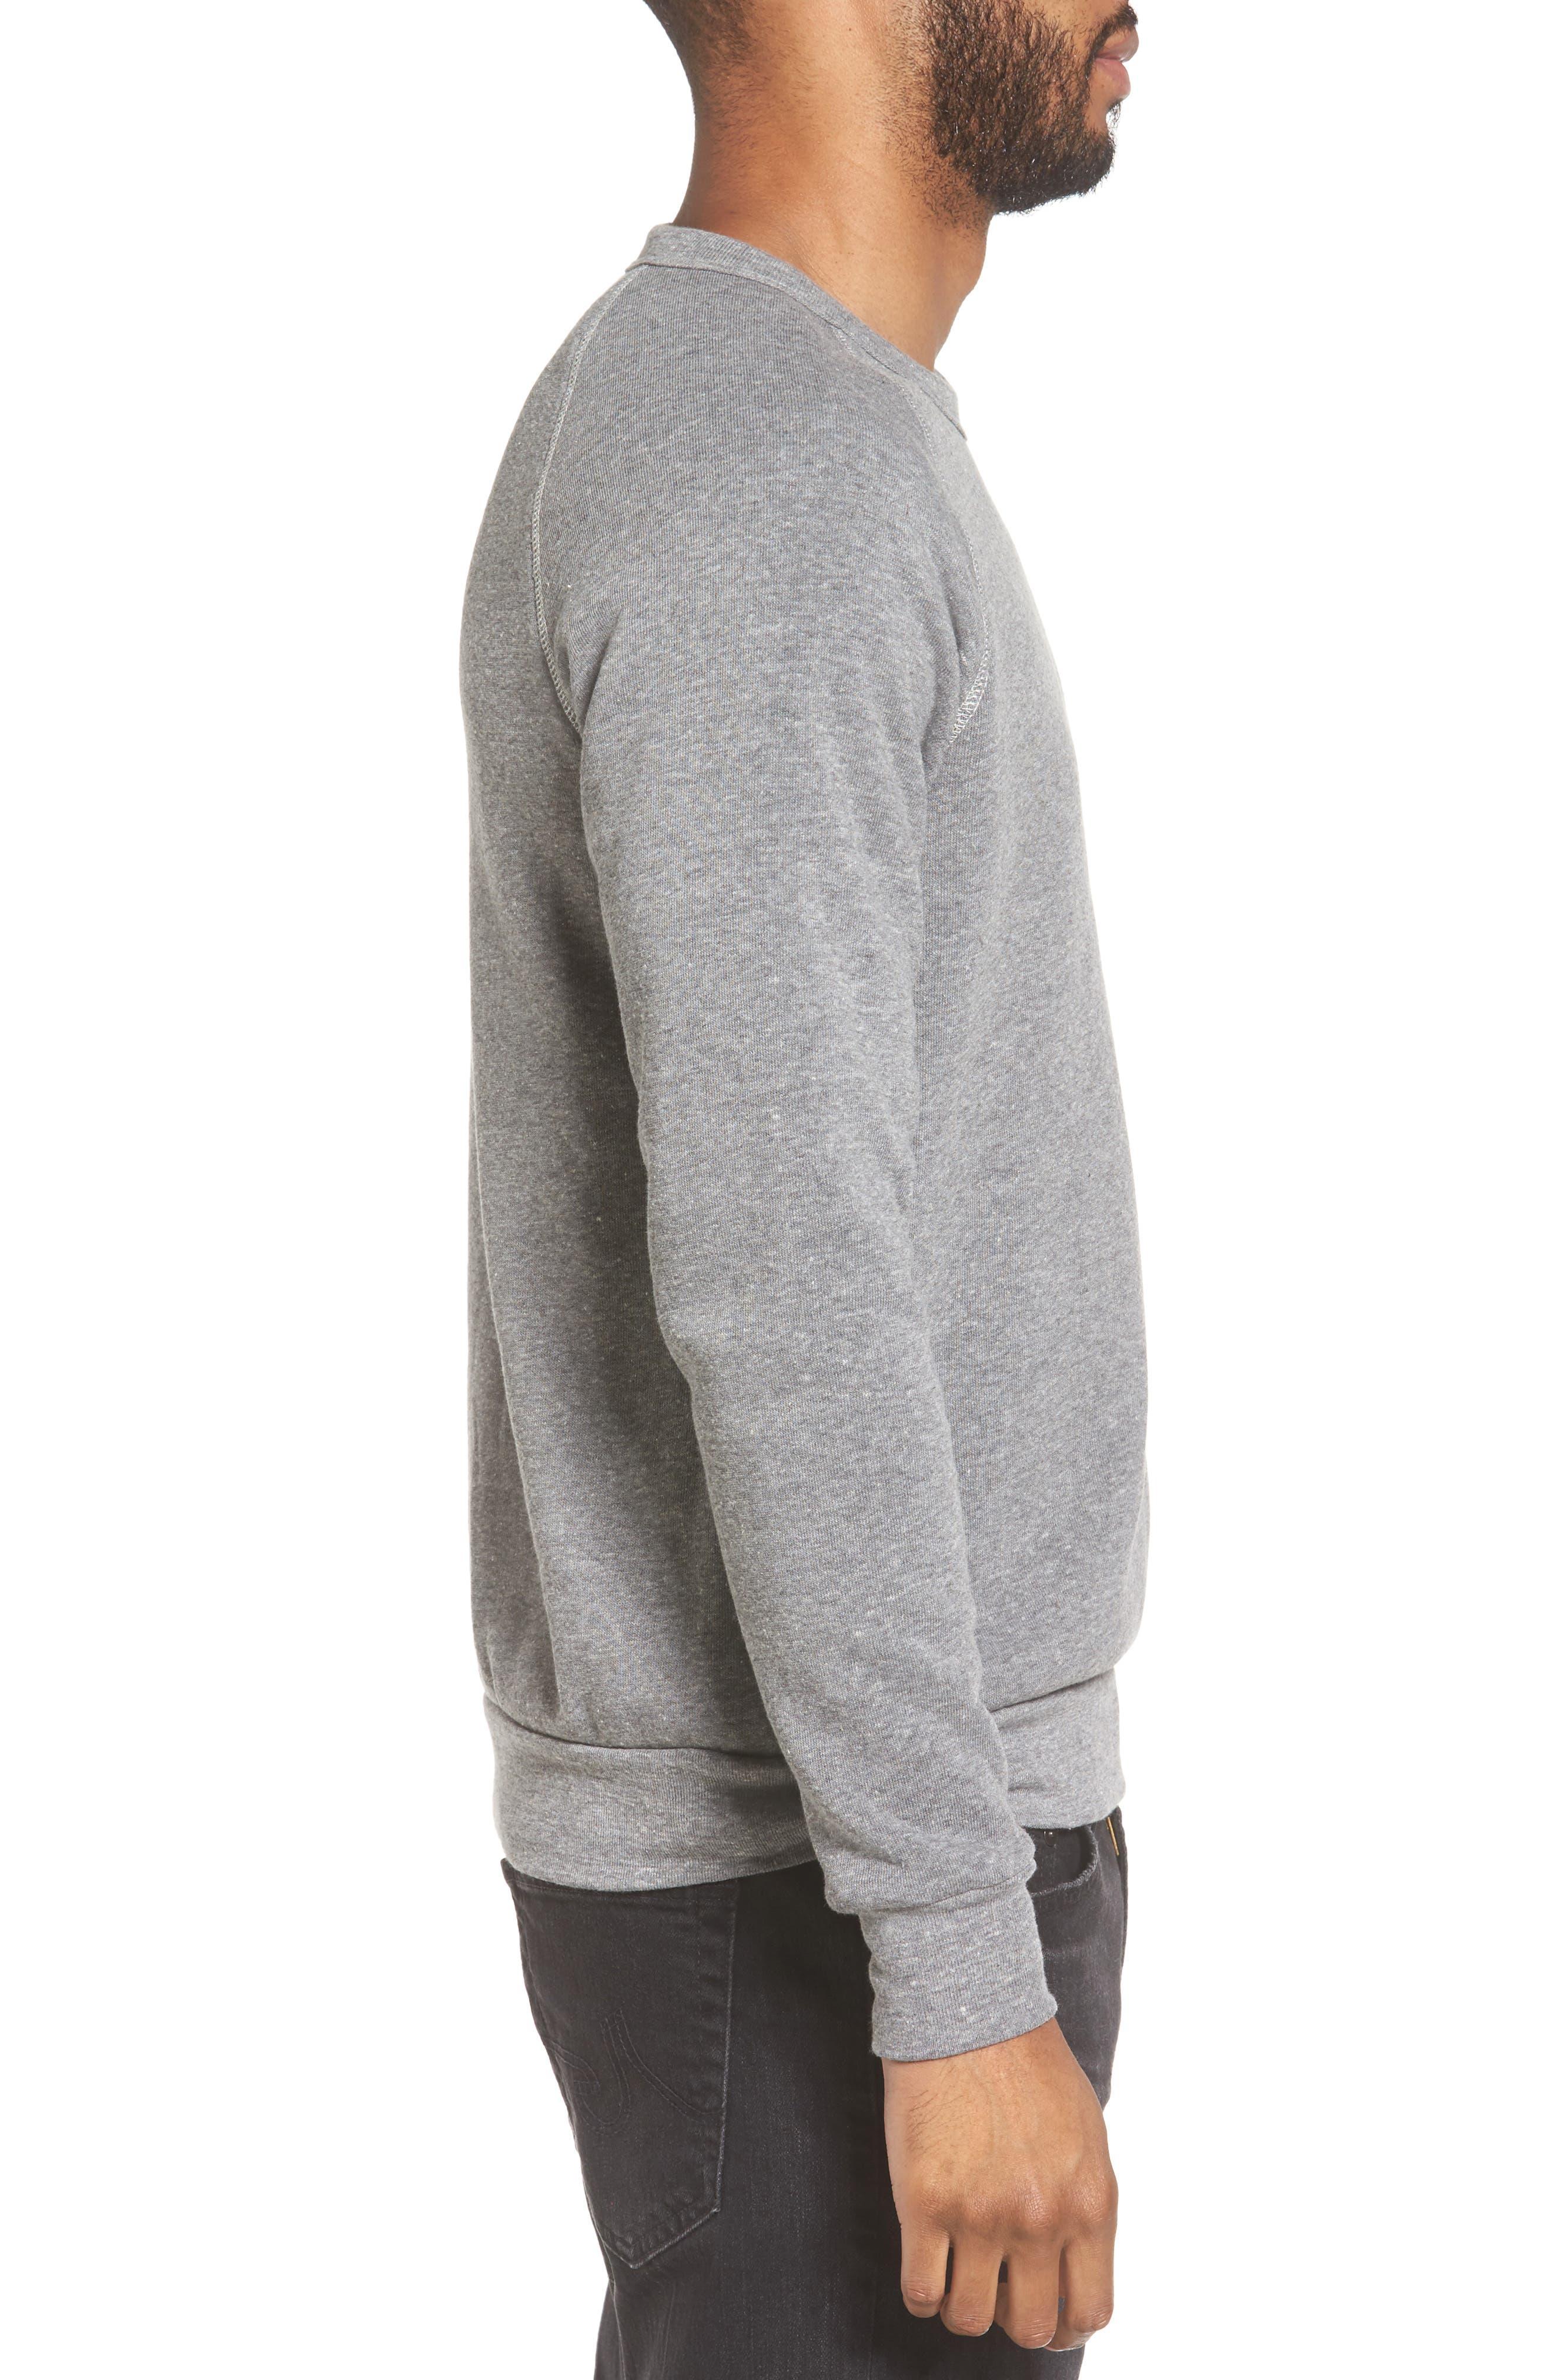 'The Champ' Sweatshirt,                             Alternate thumbnail 42, color,